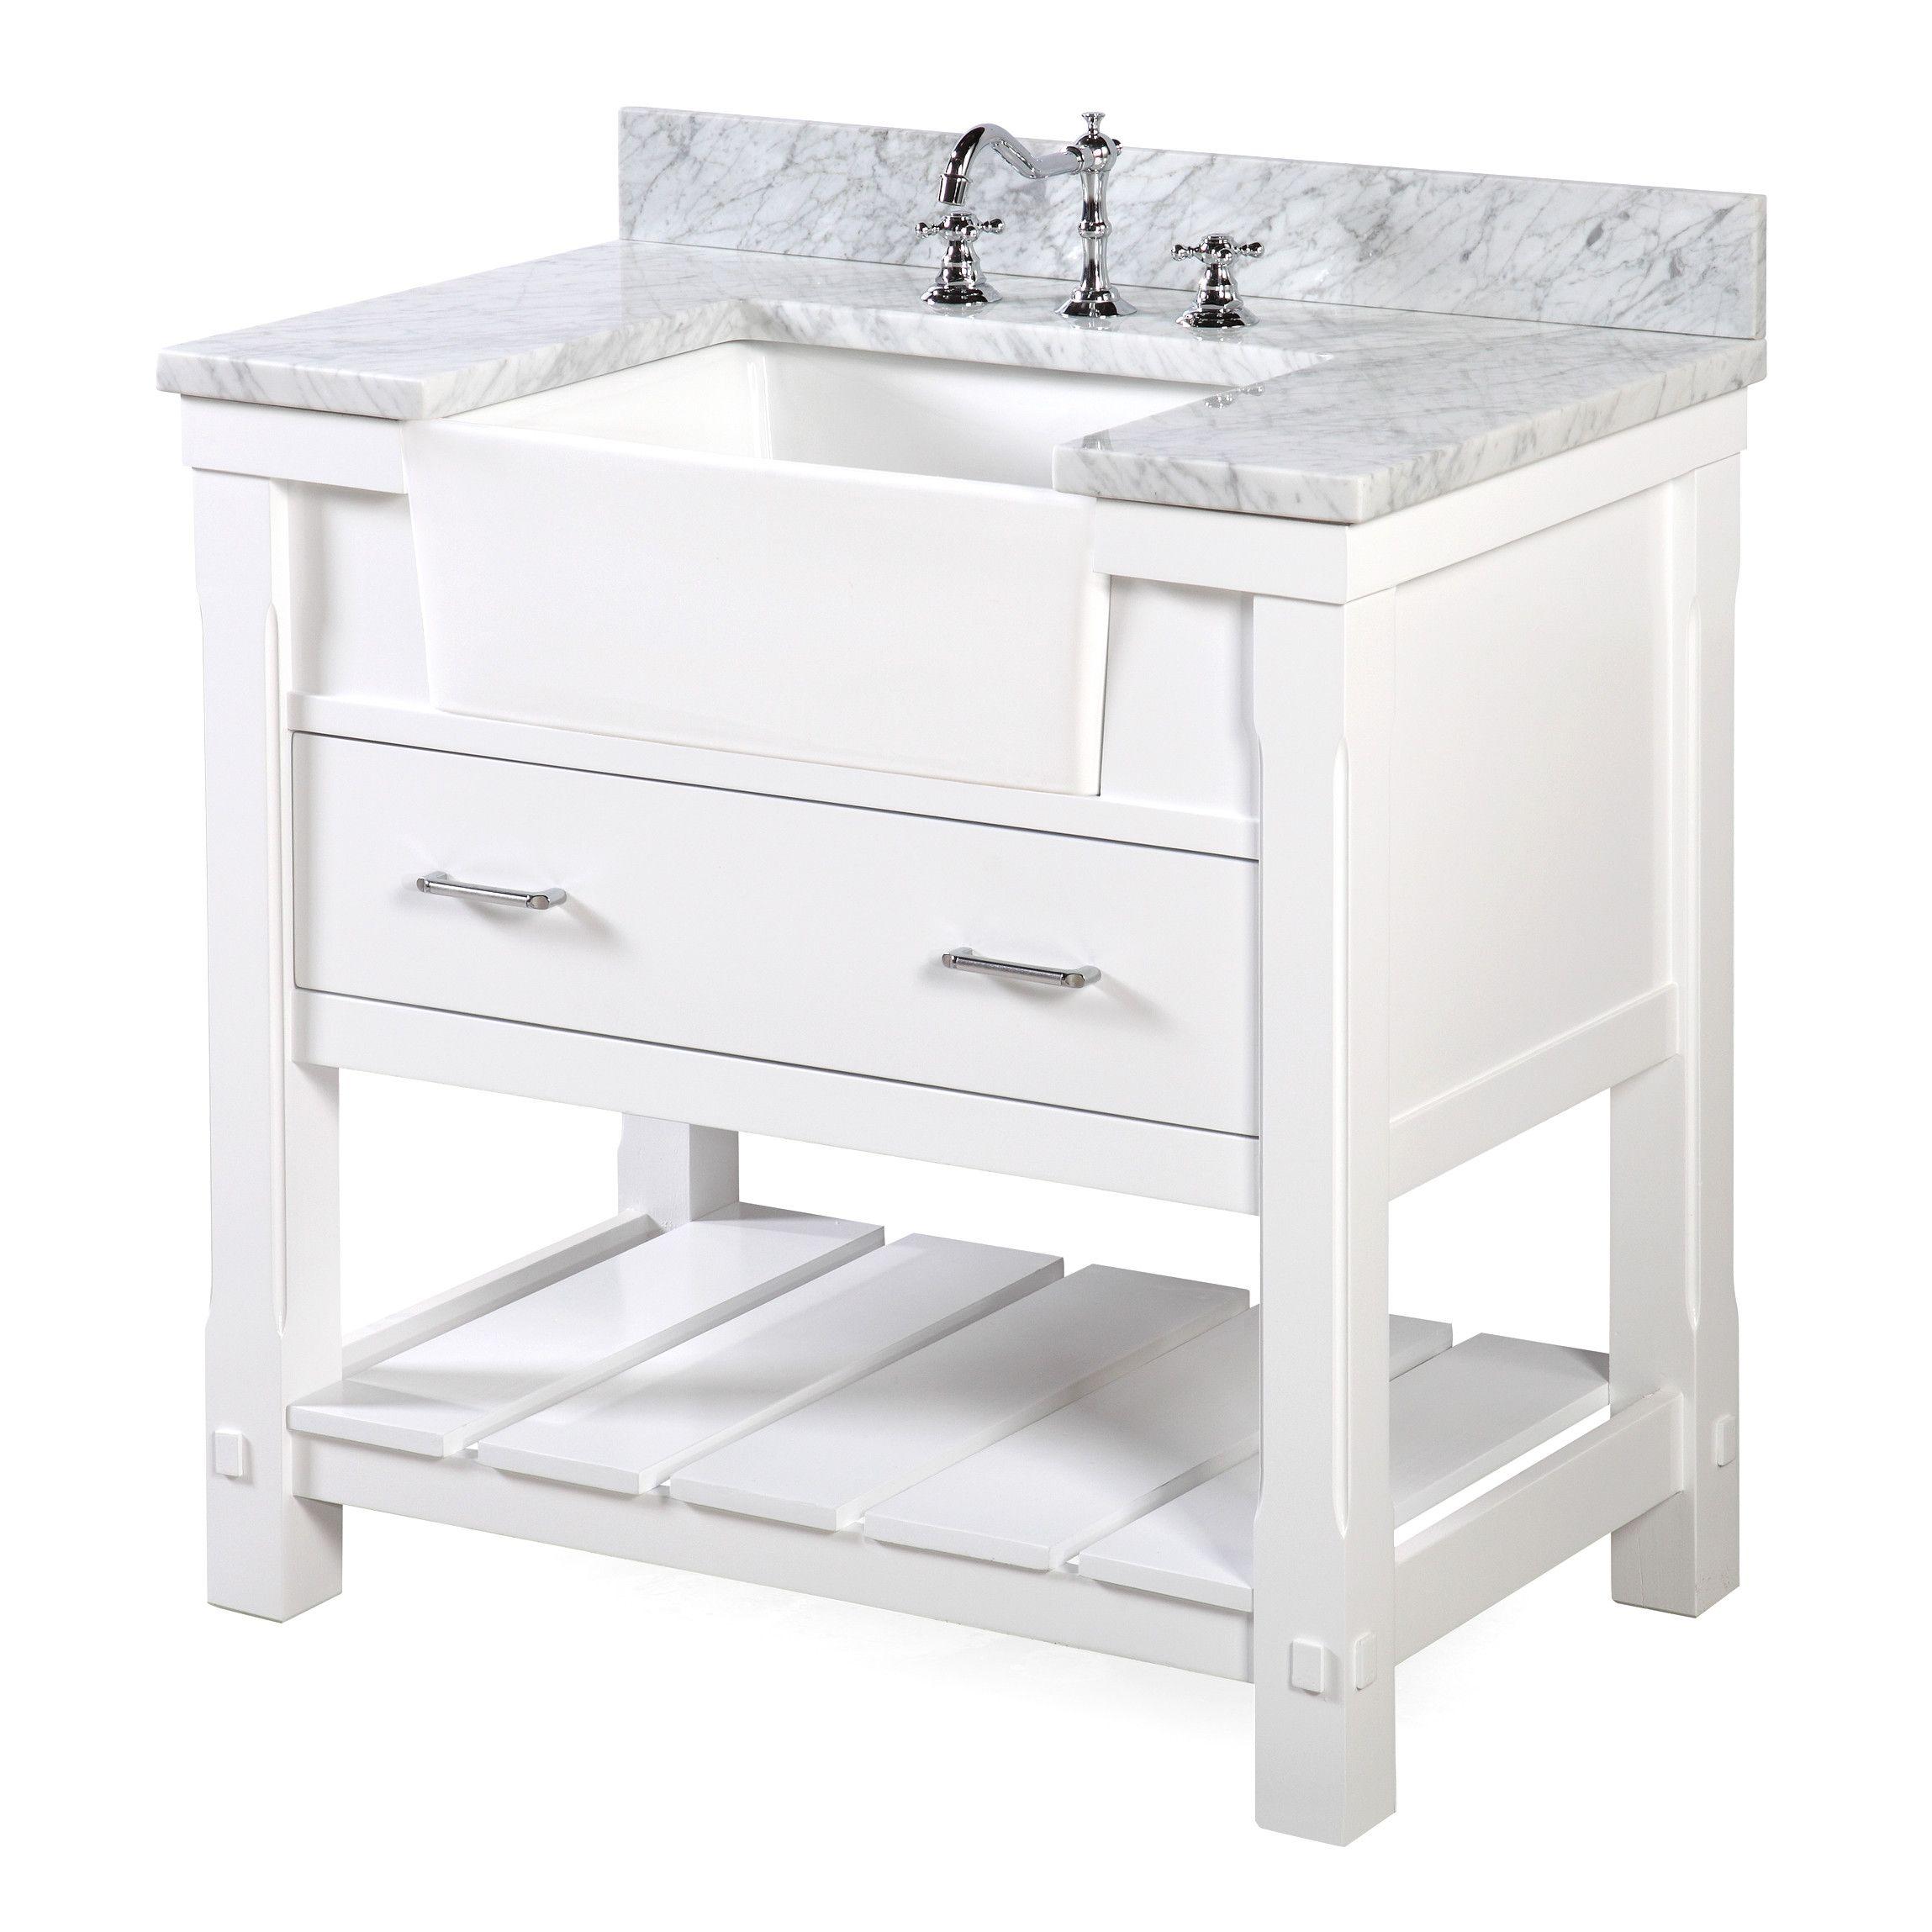 Customer Image Zoomed Single bathroom vanity, Bathroom